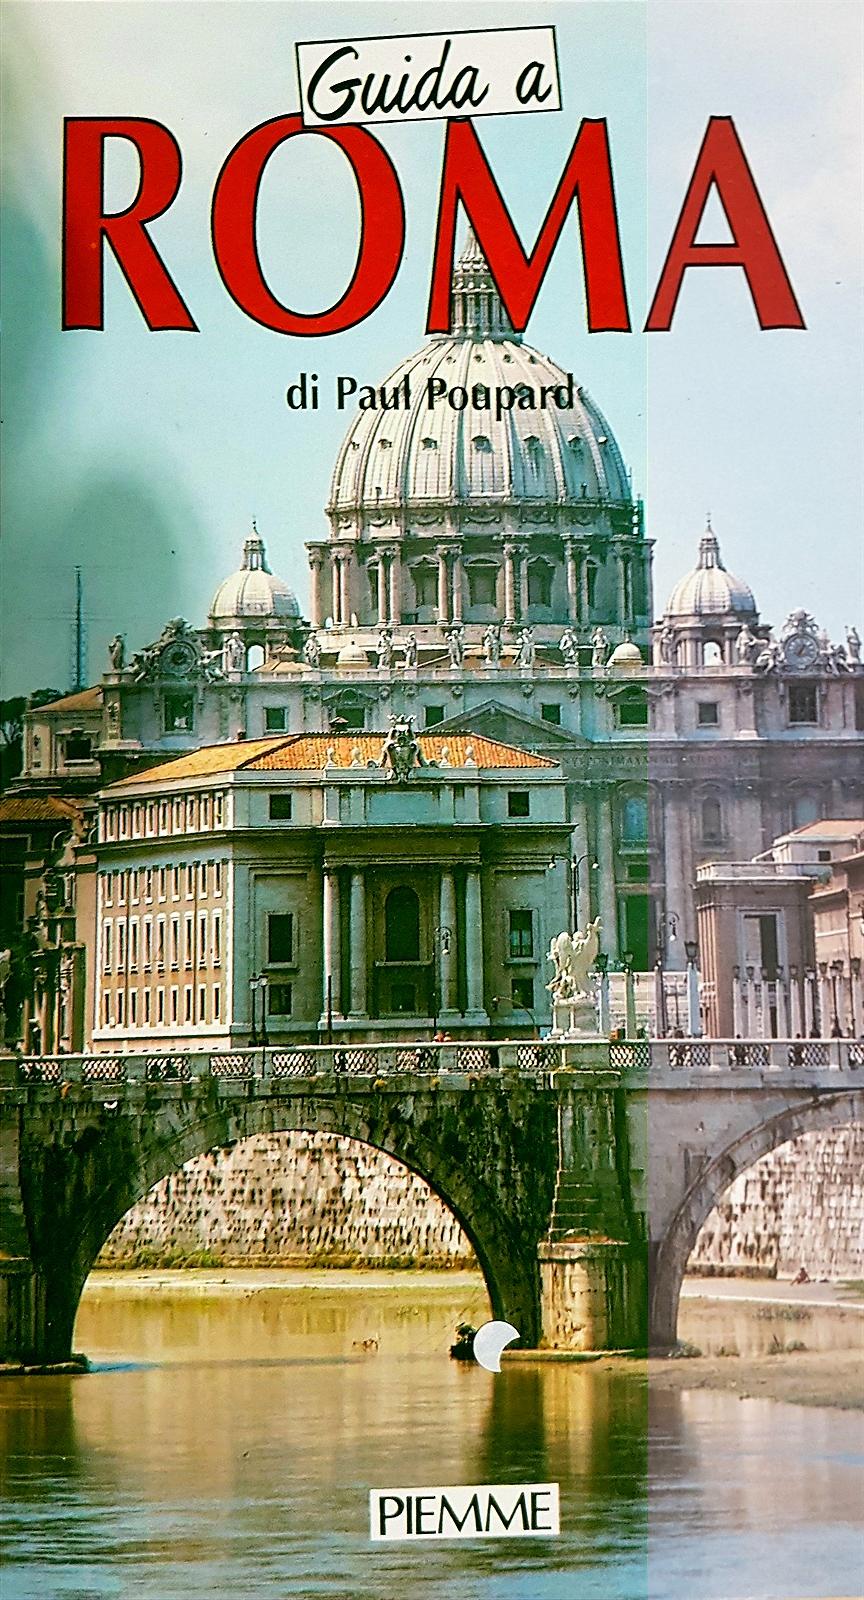 Guida a Roma